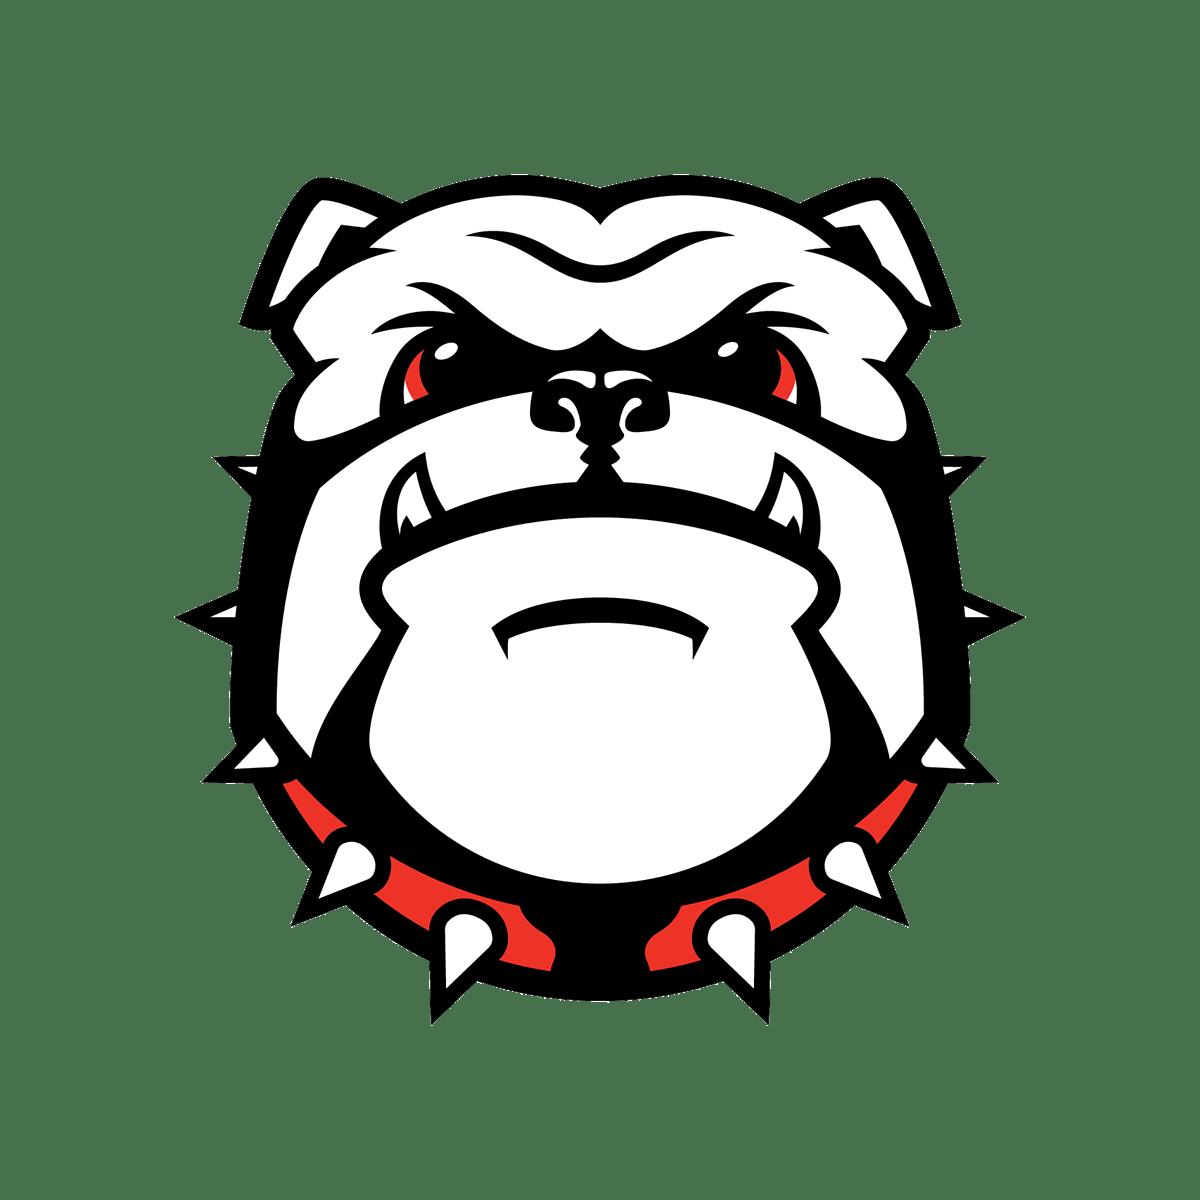 Uga Bulldog Proof Of Concept On Behance